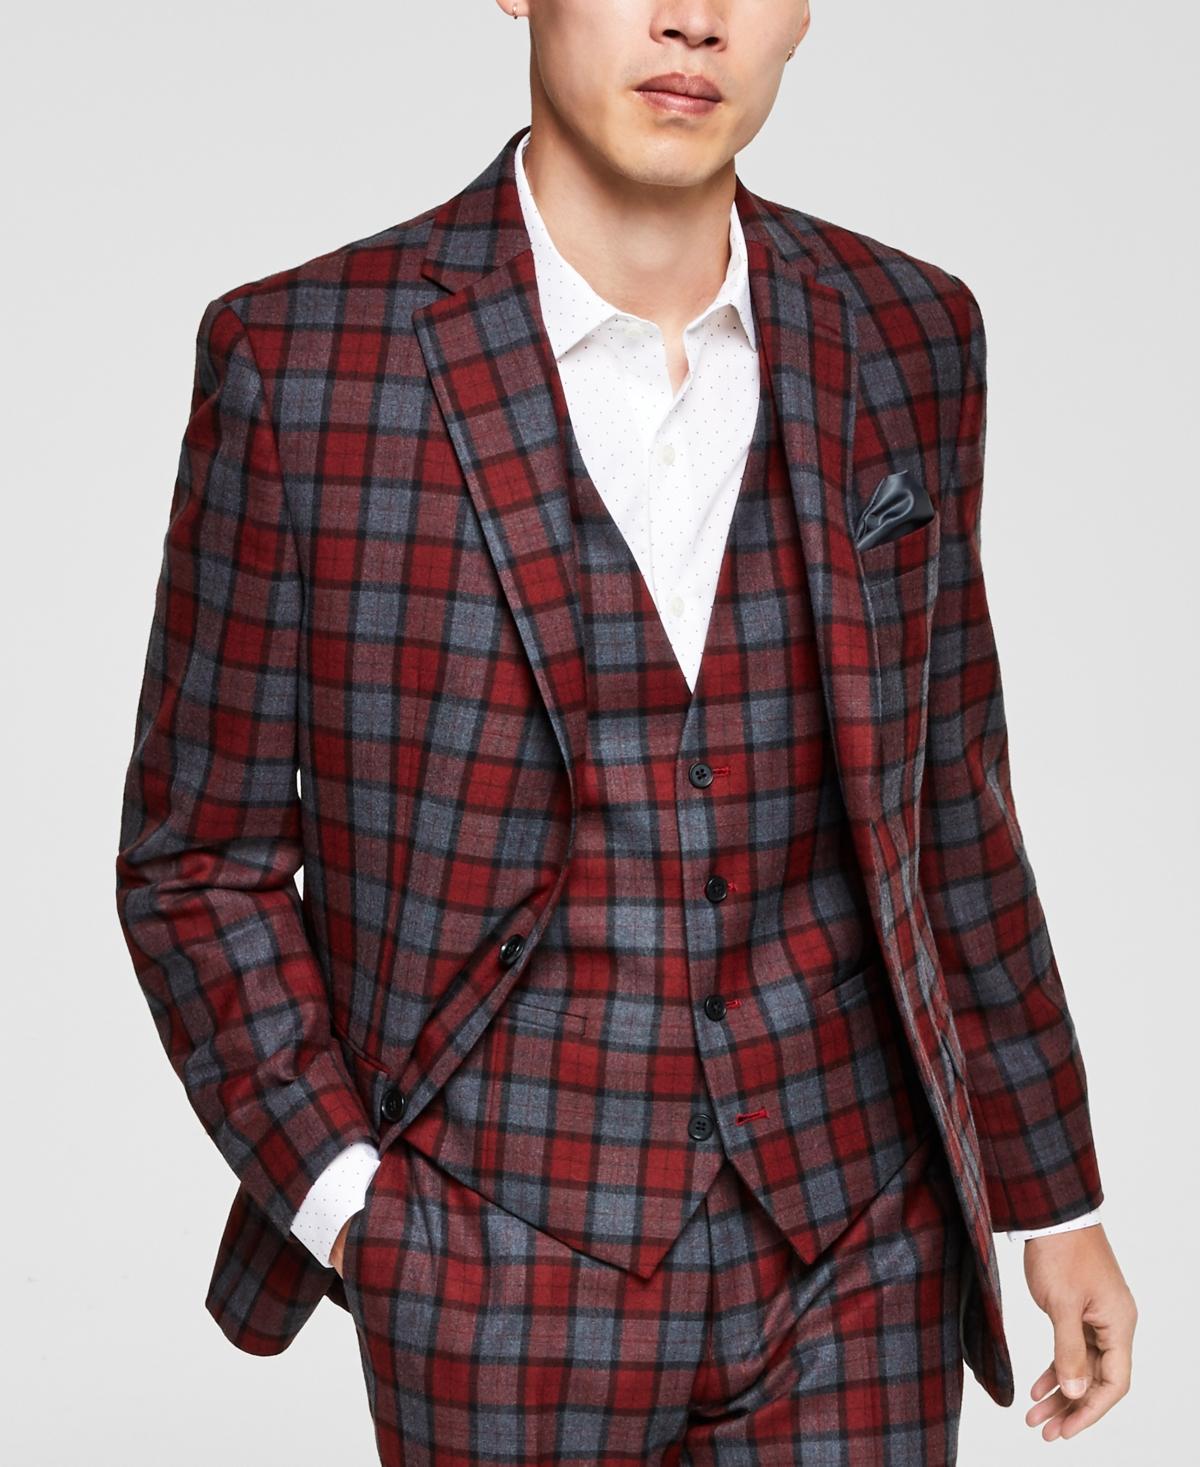 1960s Men's Clothing Bar Iii Mens Slim-Fit RedGray Plaid Suit Jacket Created for Macys $425.00 AT vintagedancer.com